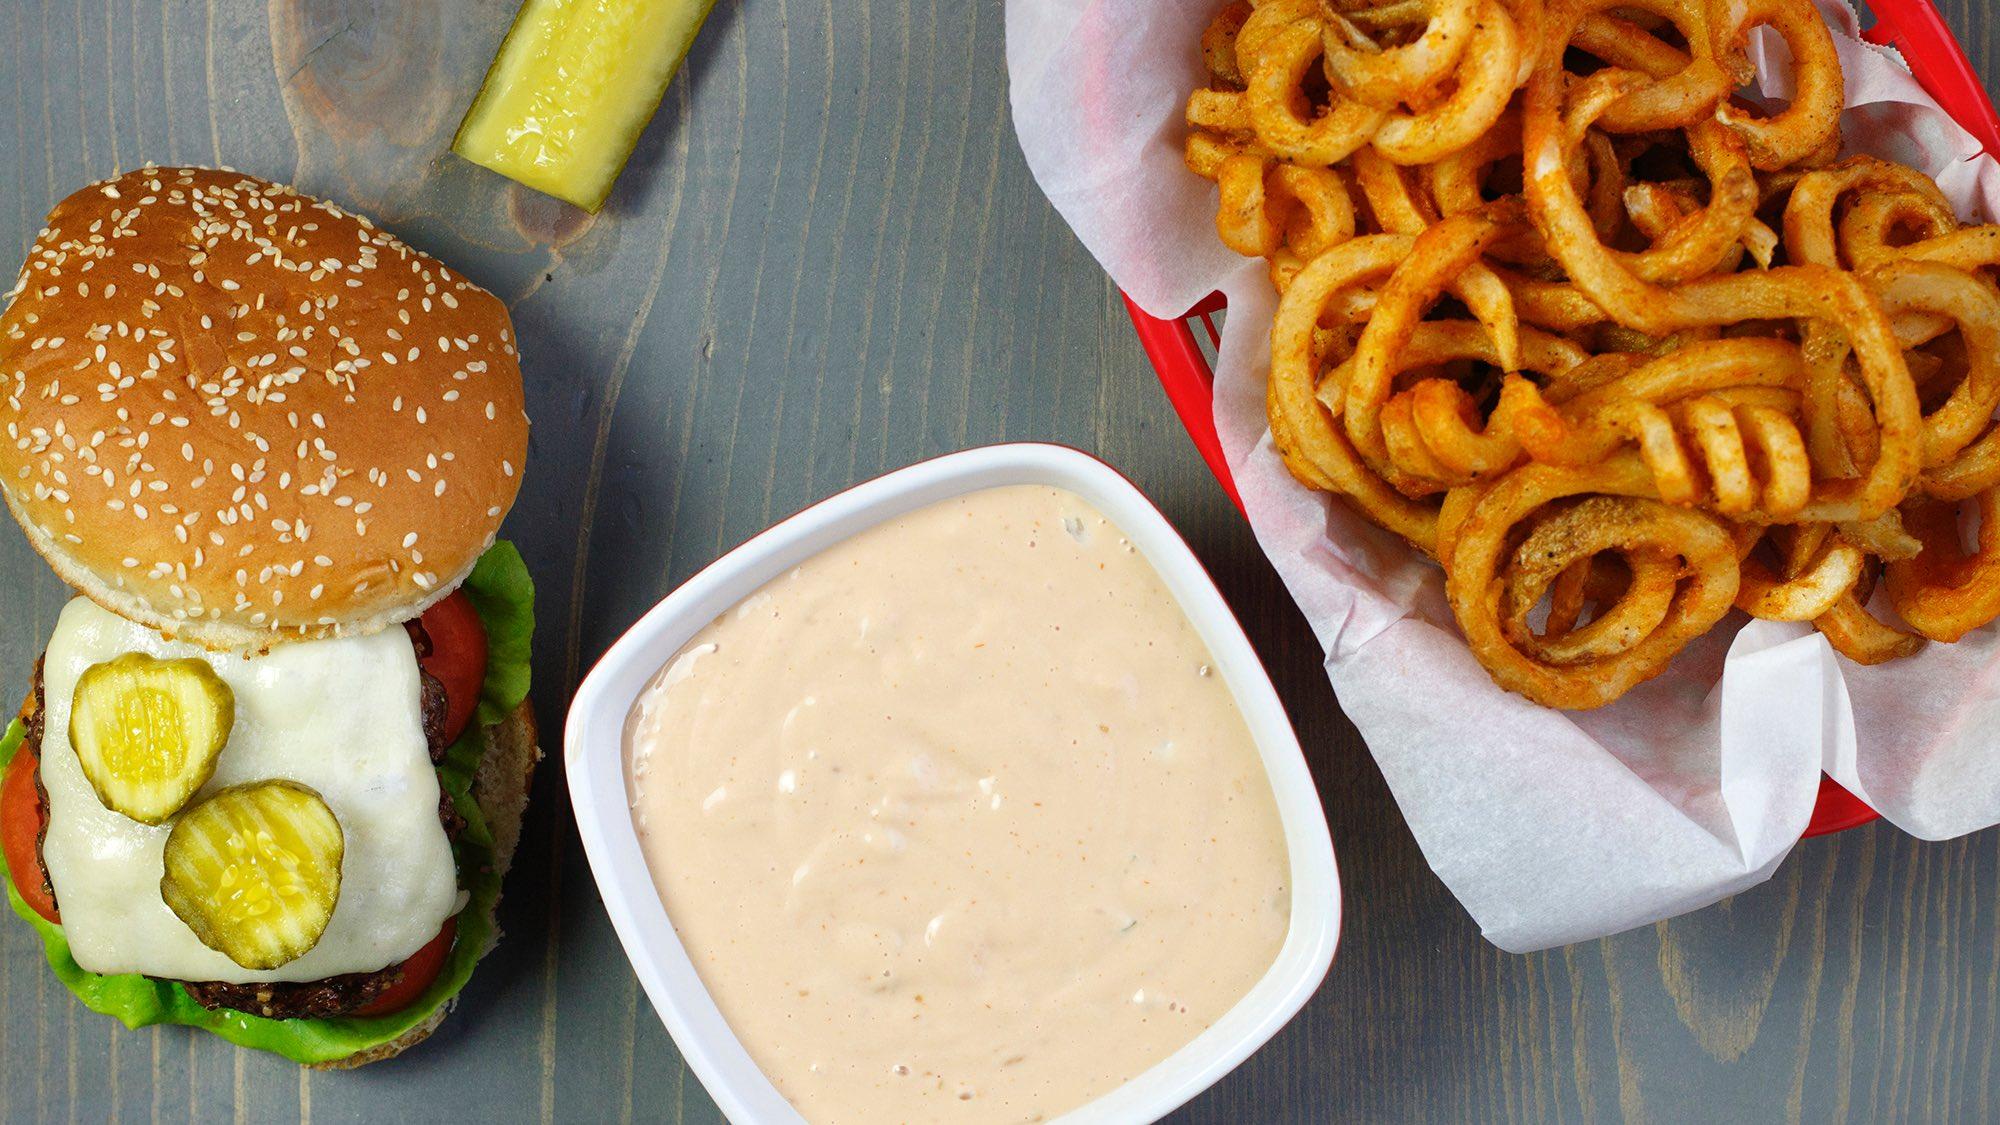 utah-fry-sauce.jpg